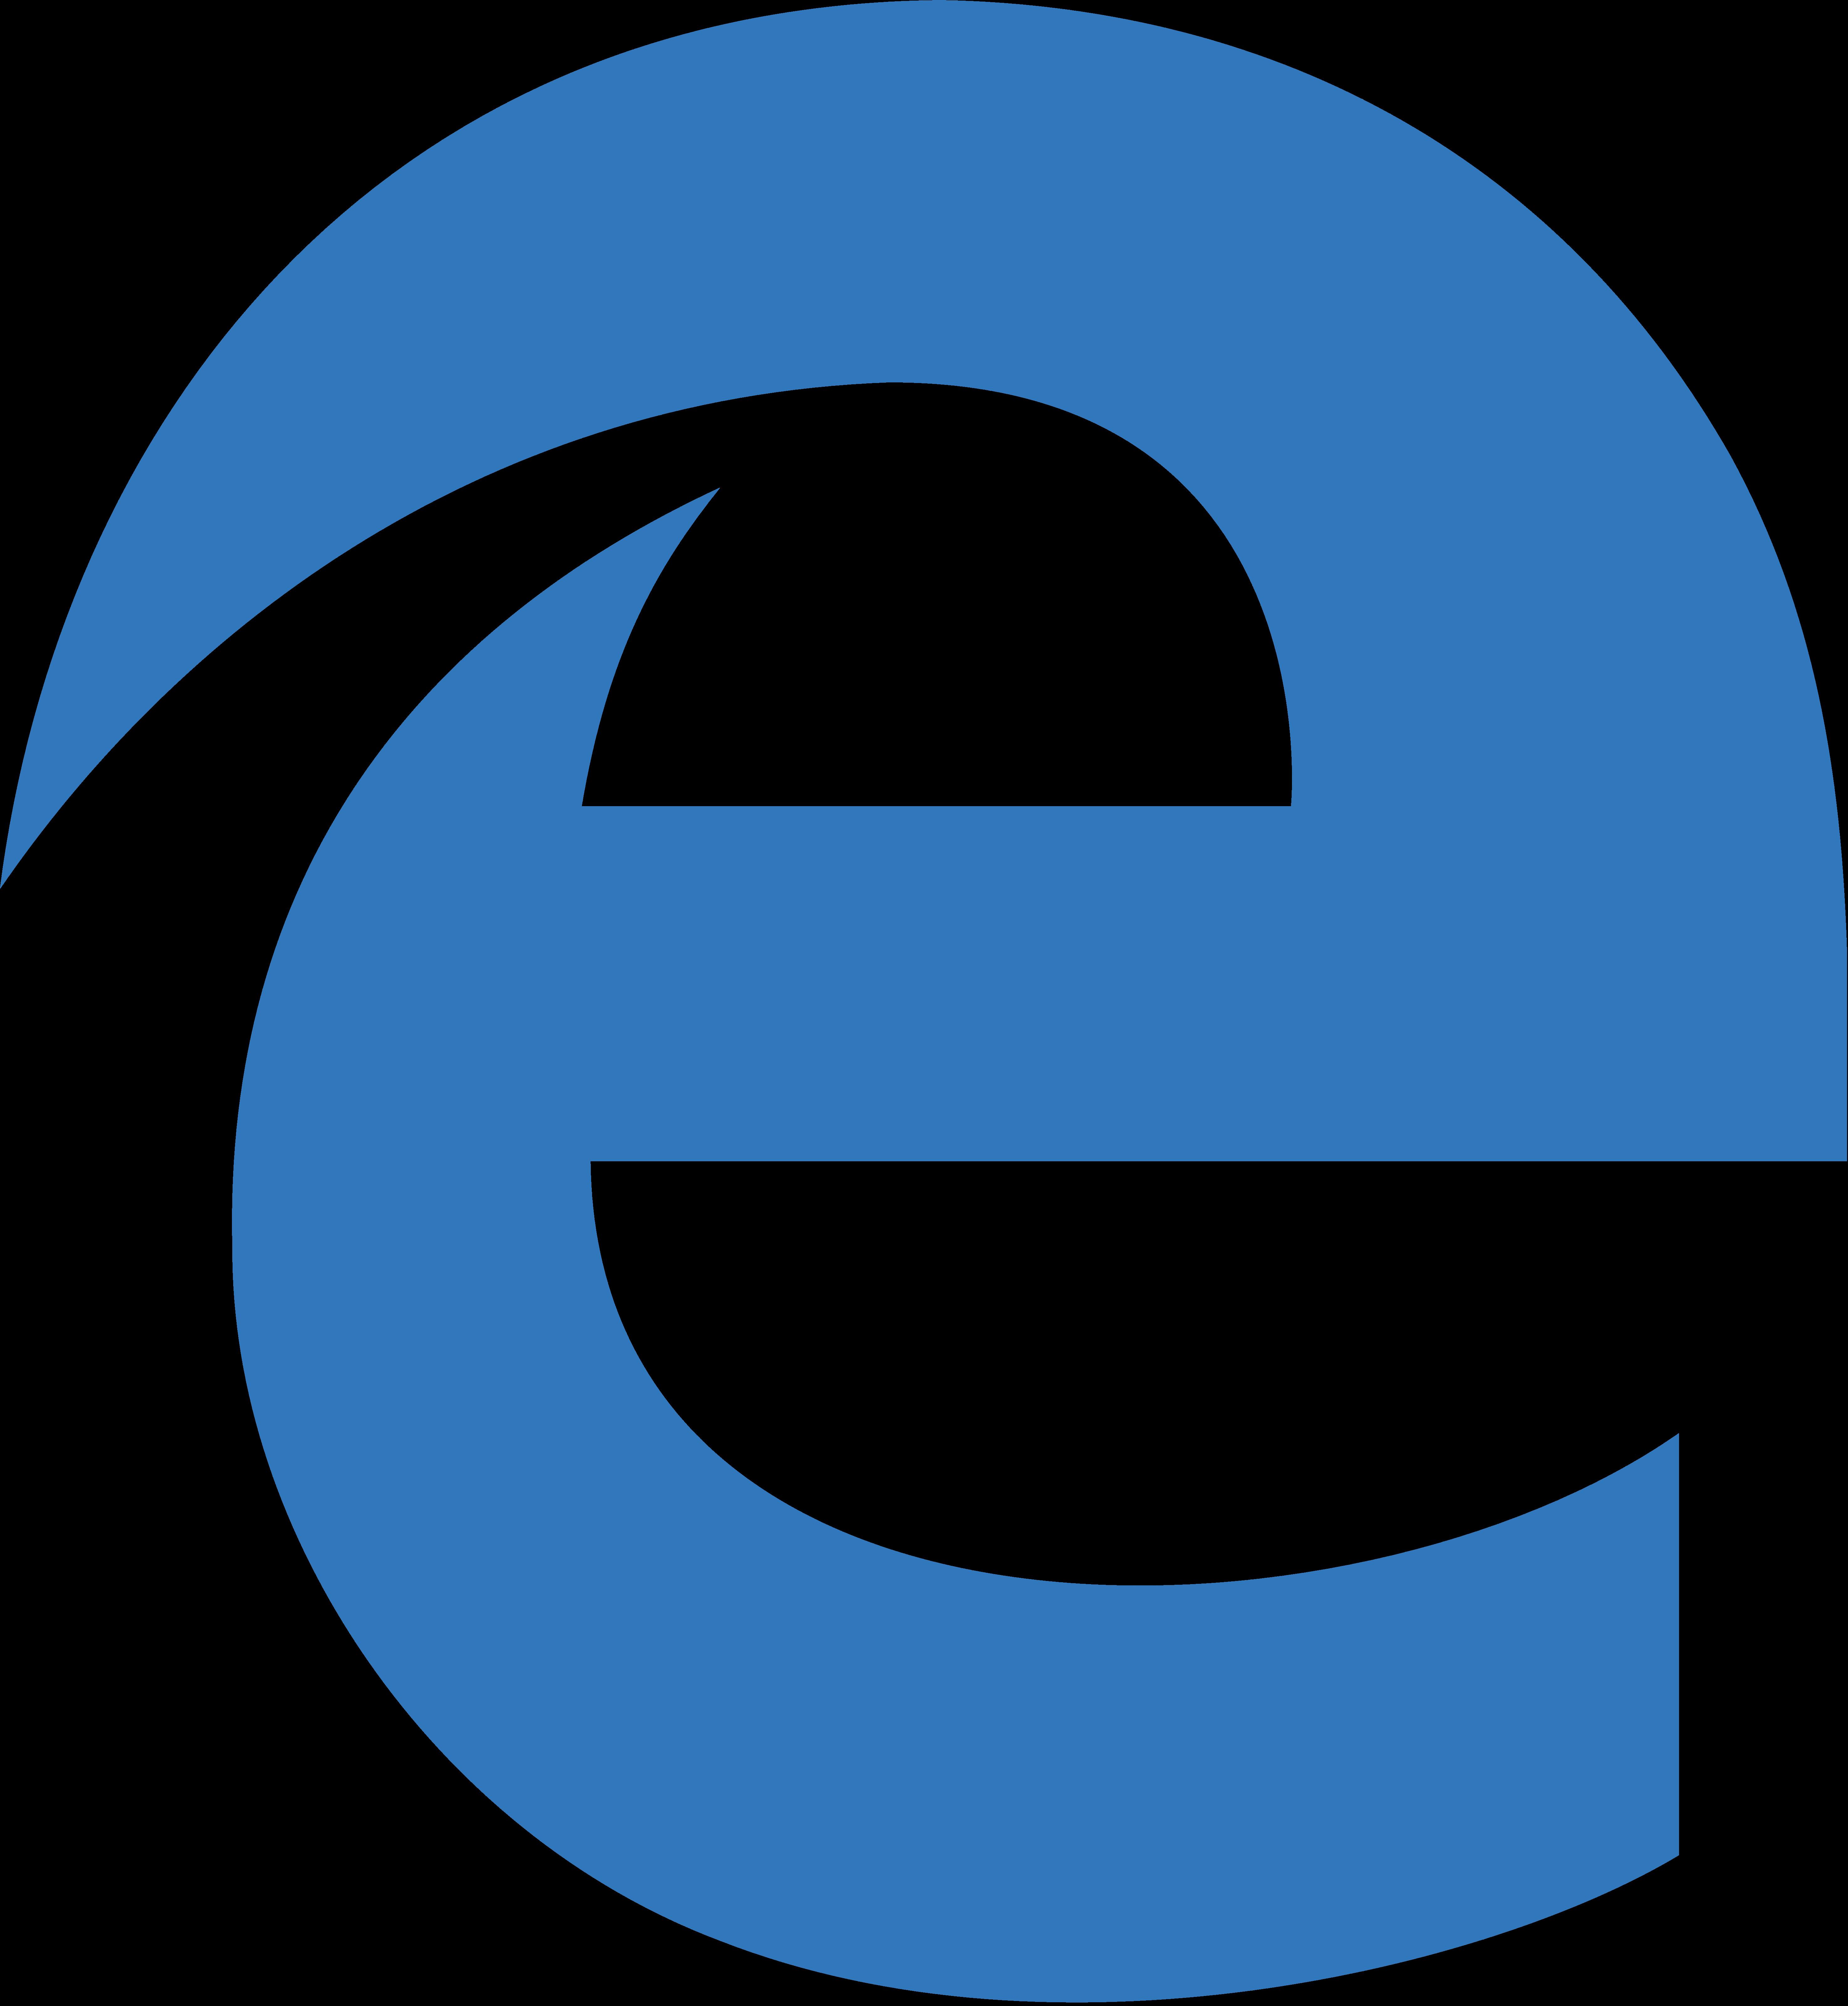 Microsoft Edge – Logos Download